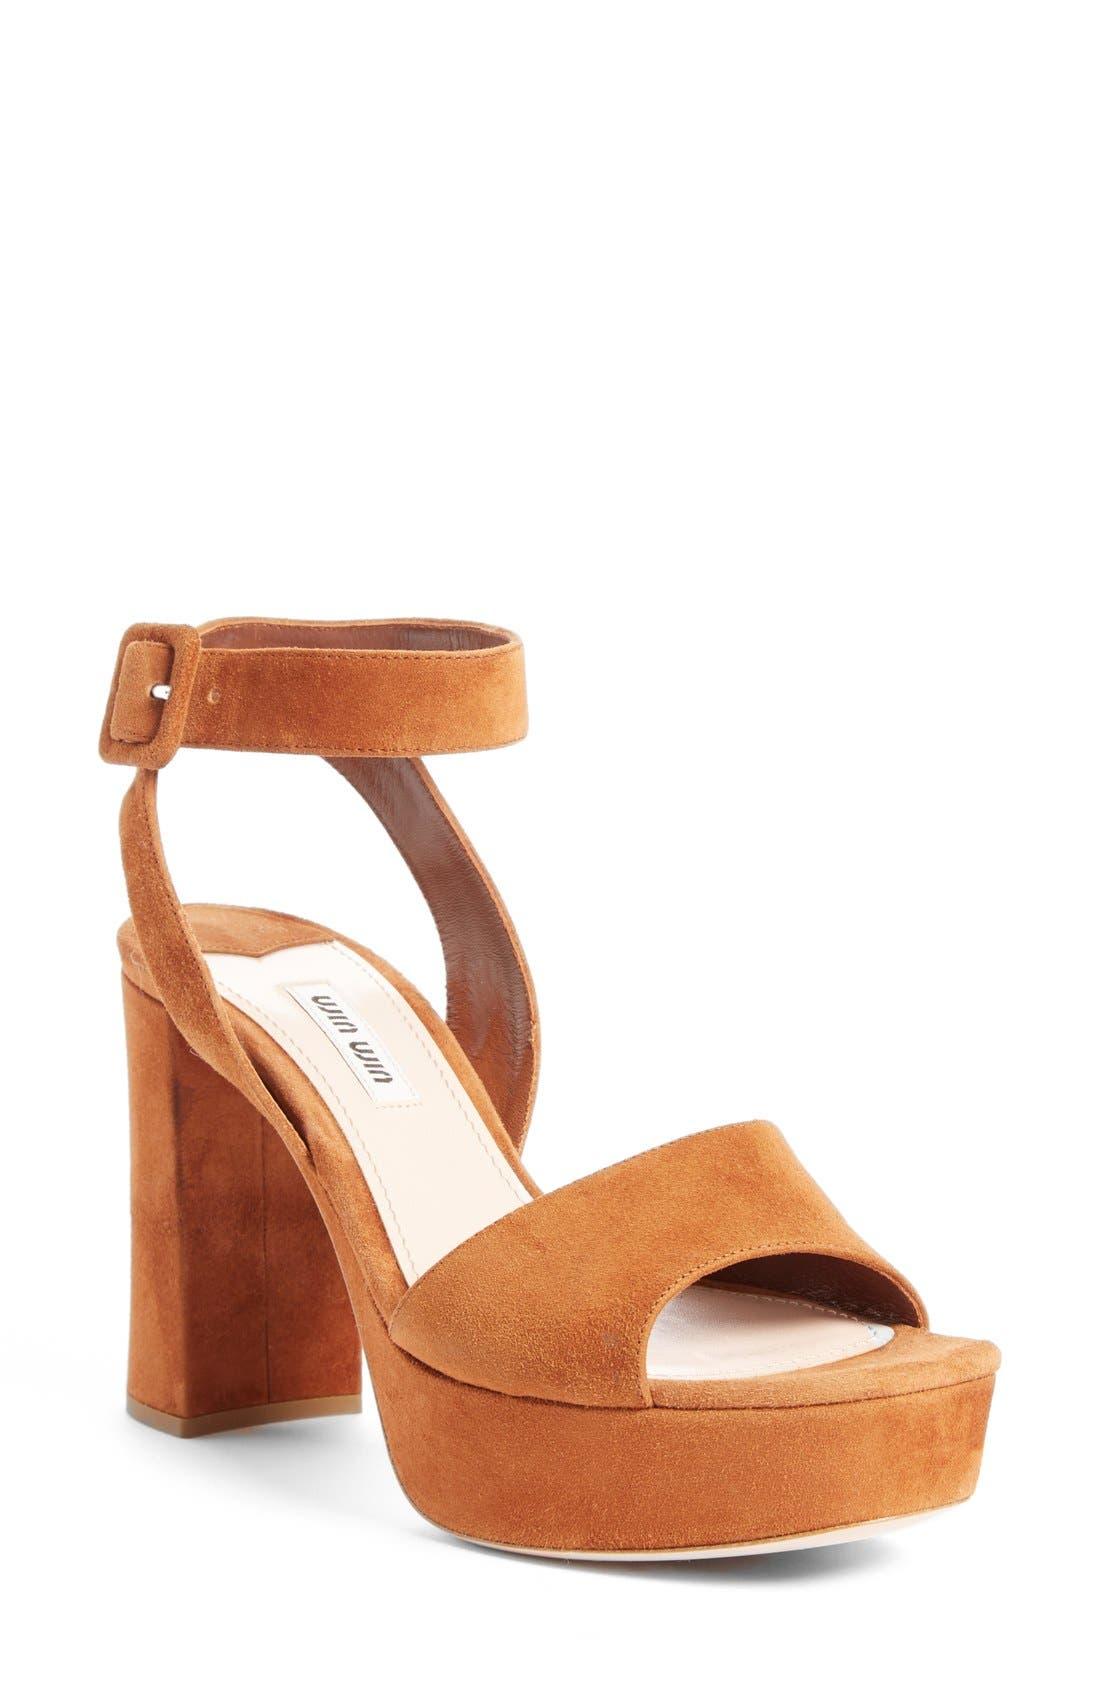 'Sandali' Ankle Strap Sandal,                             Main thumbnail 1, color,